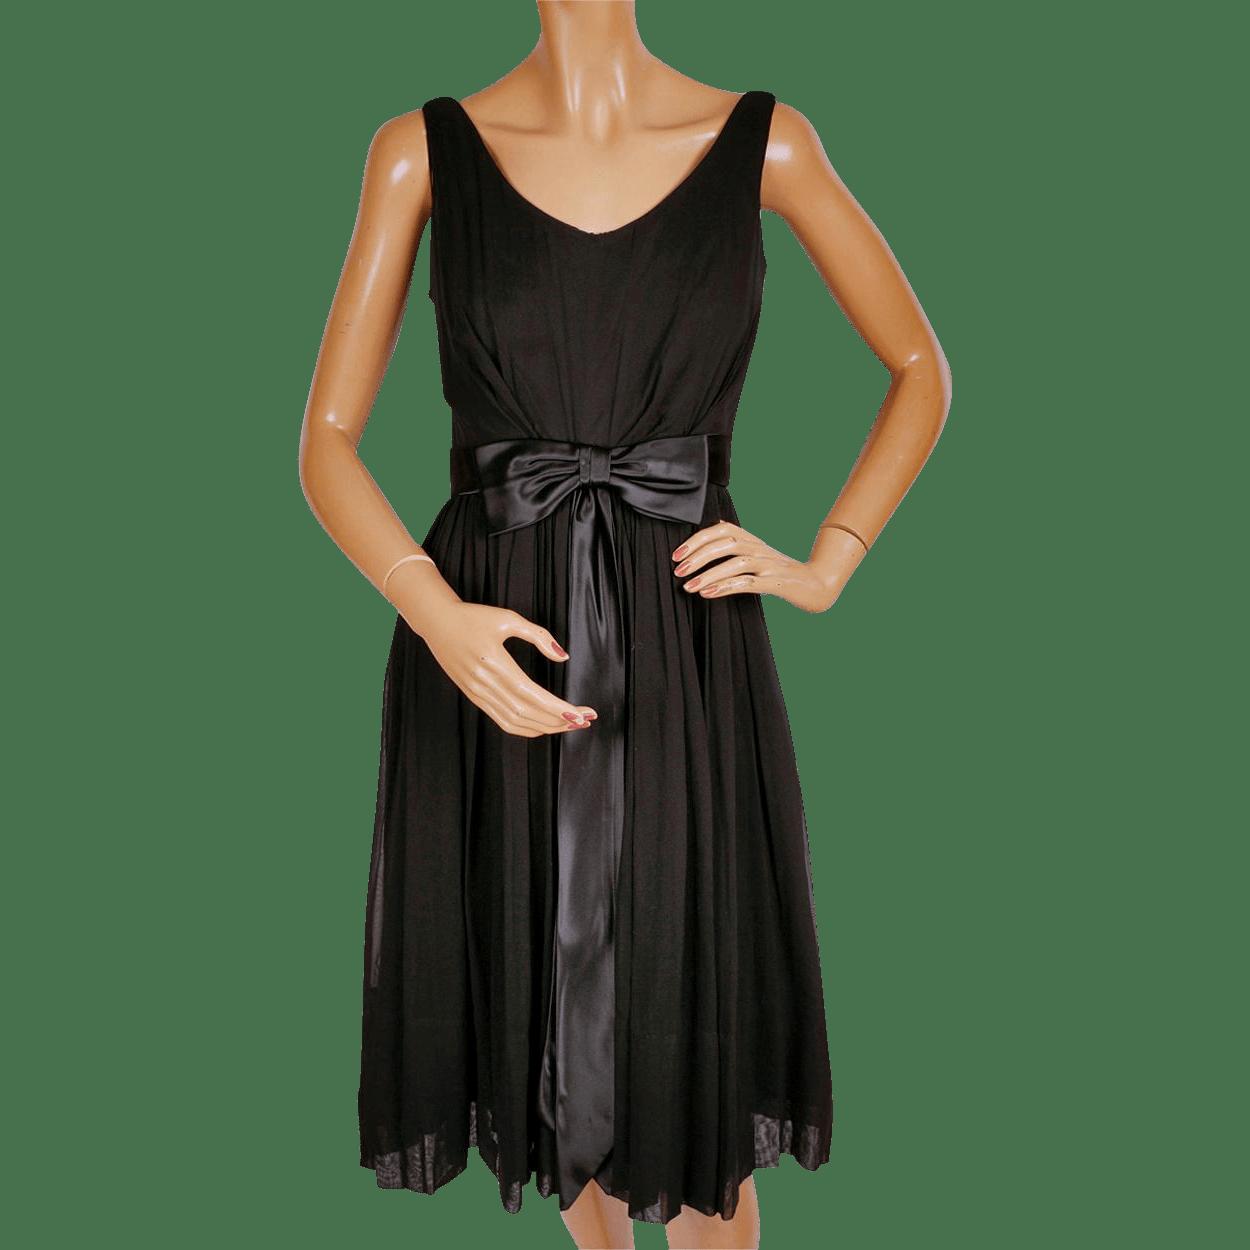 Vintage 1960s Cocktail Party Dress